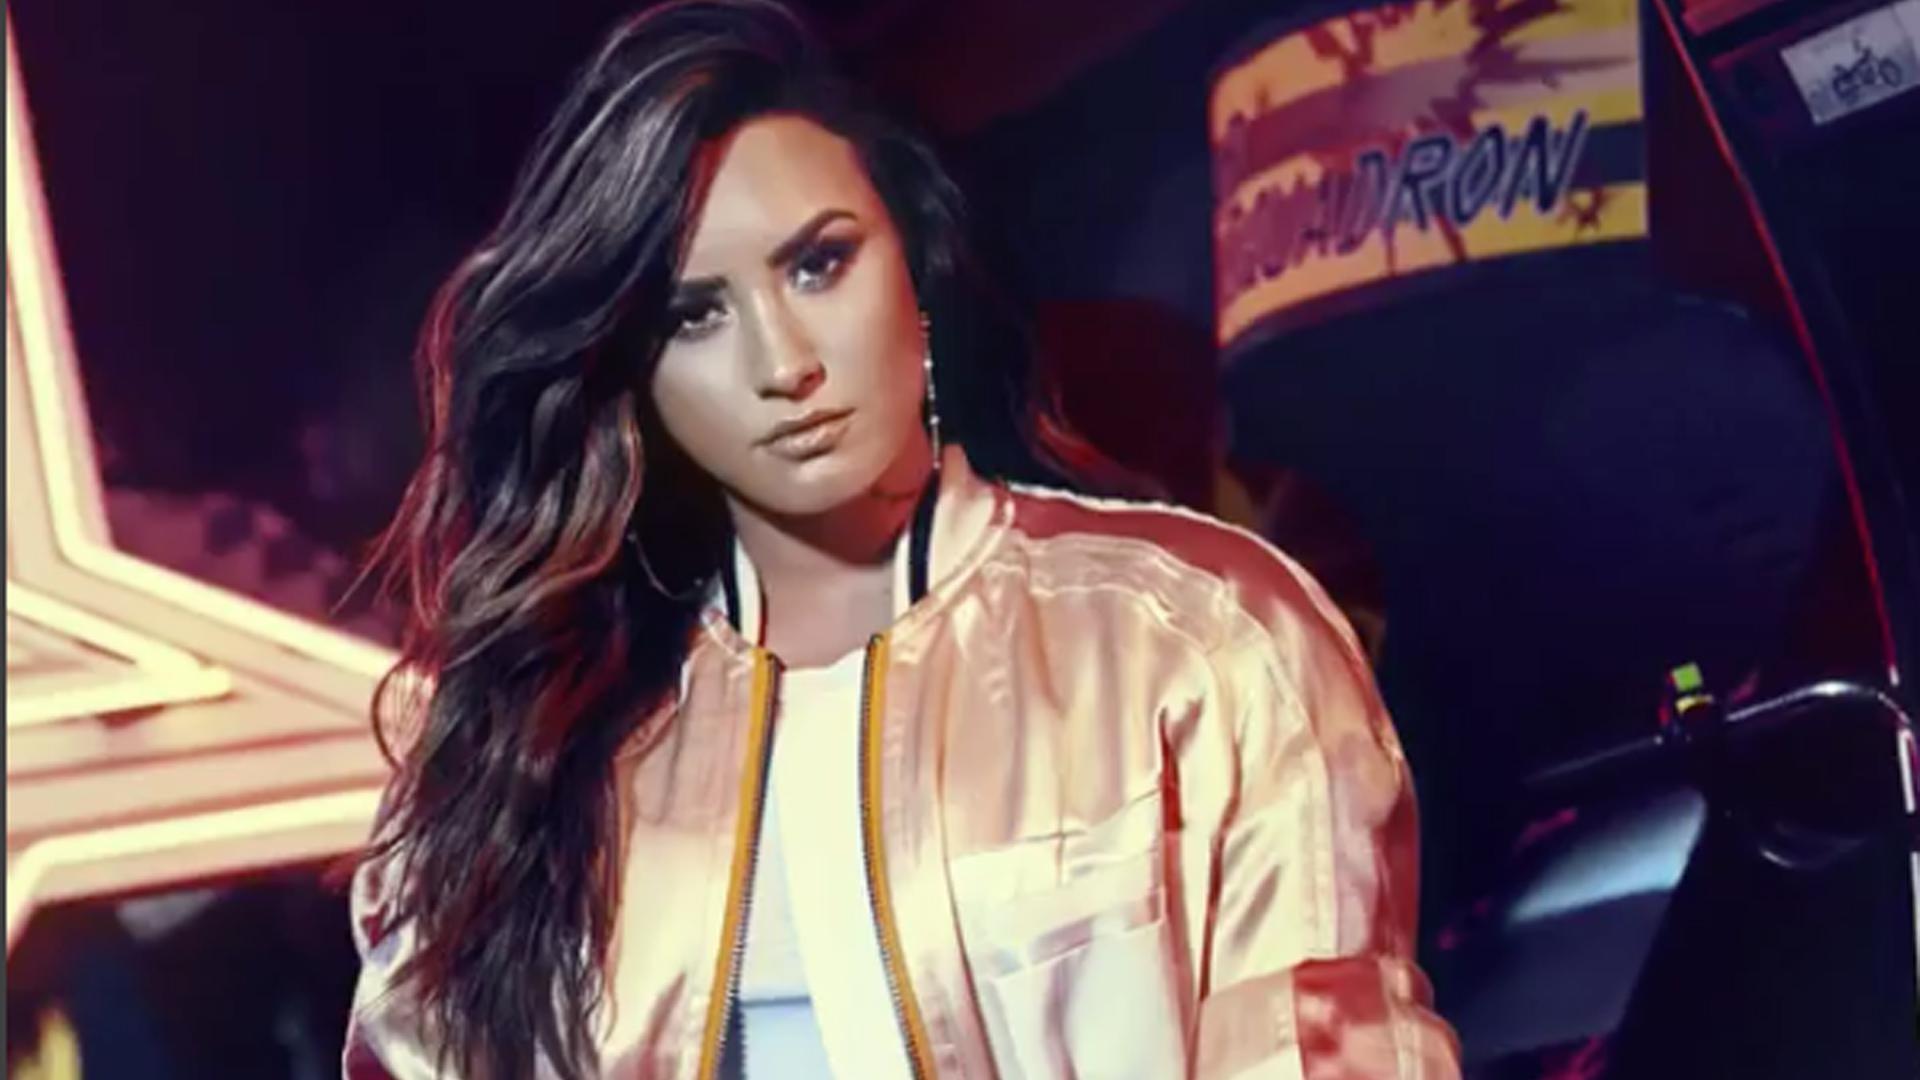 Demi Lovato Daddy Yankee Support Daca Spotify Playlist